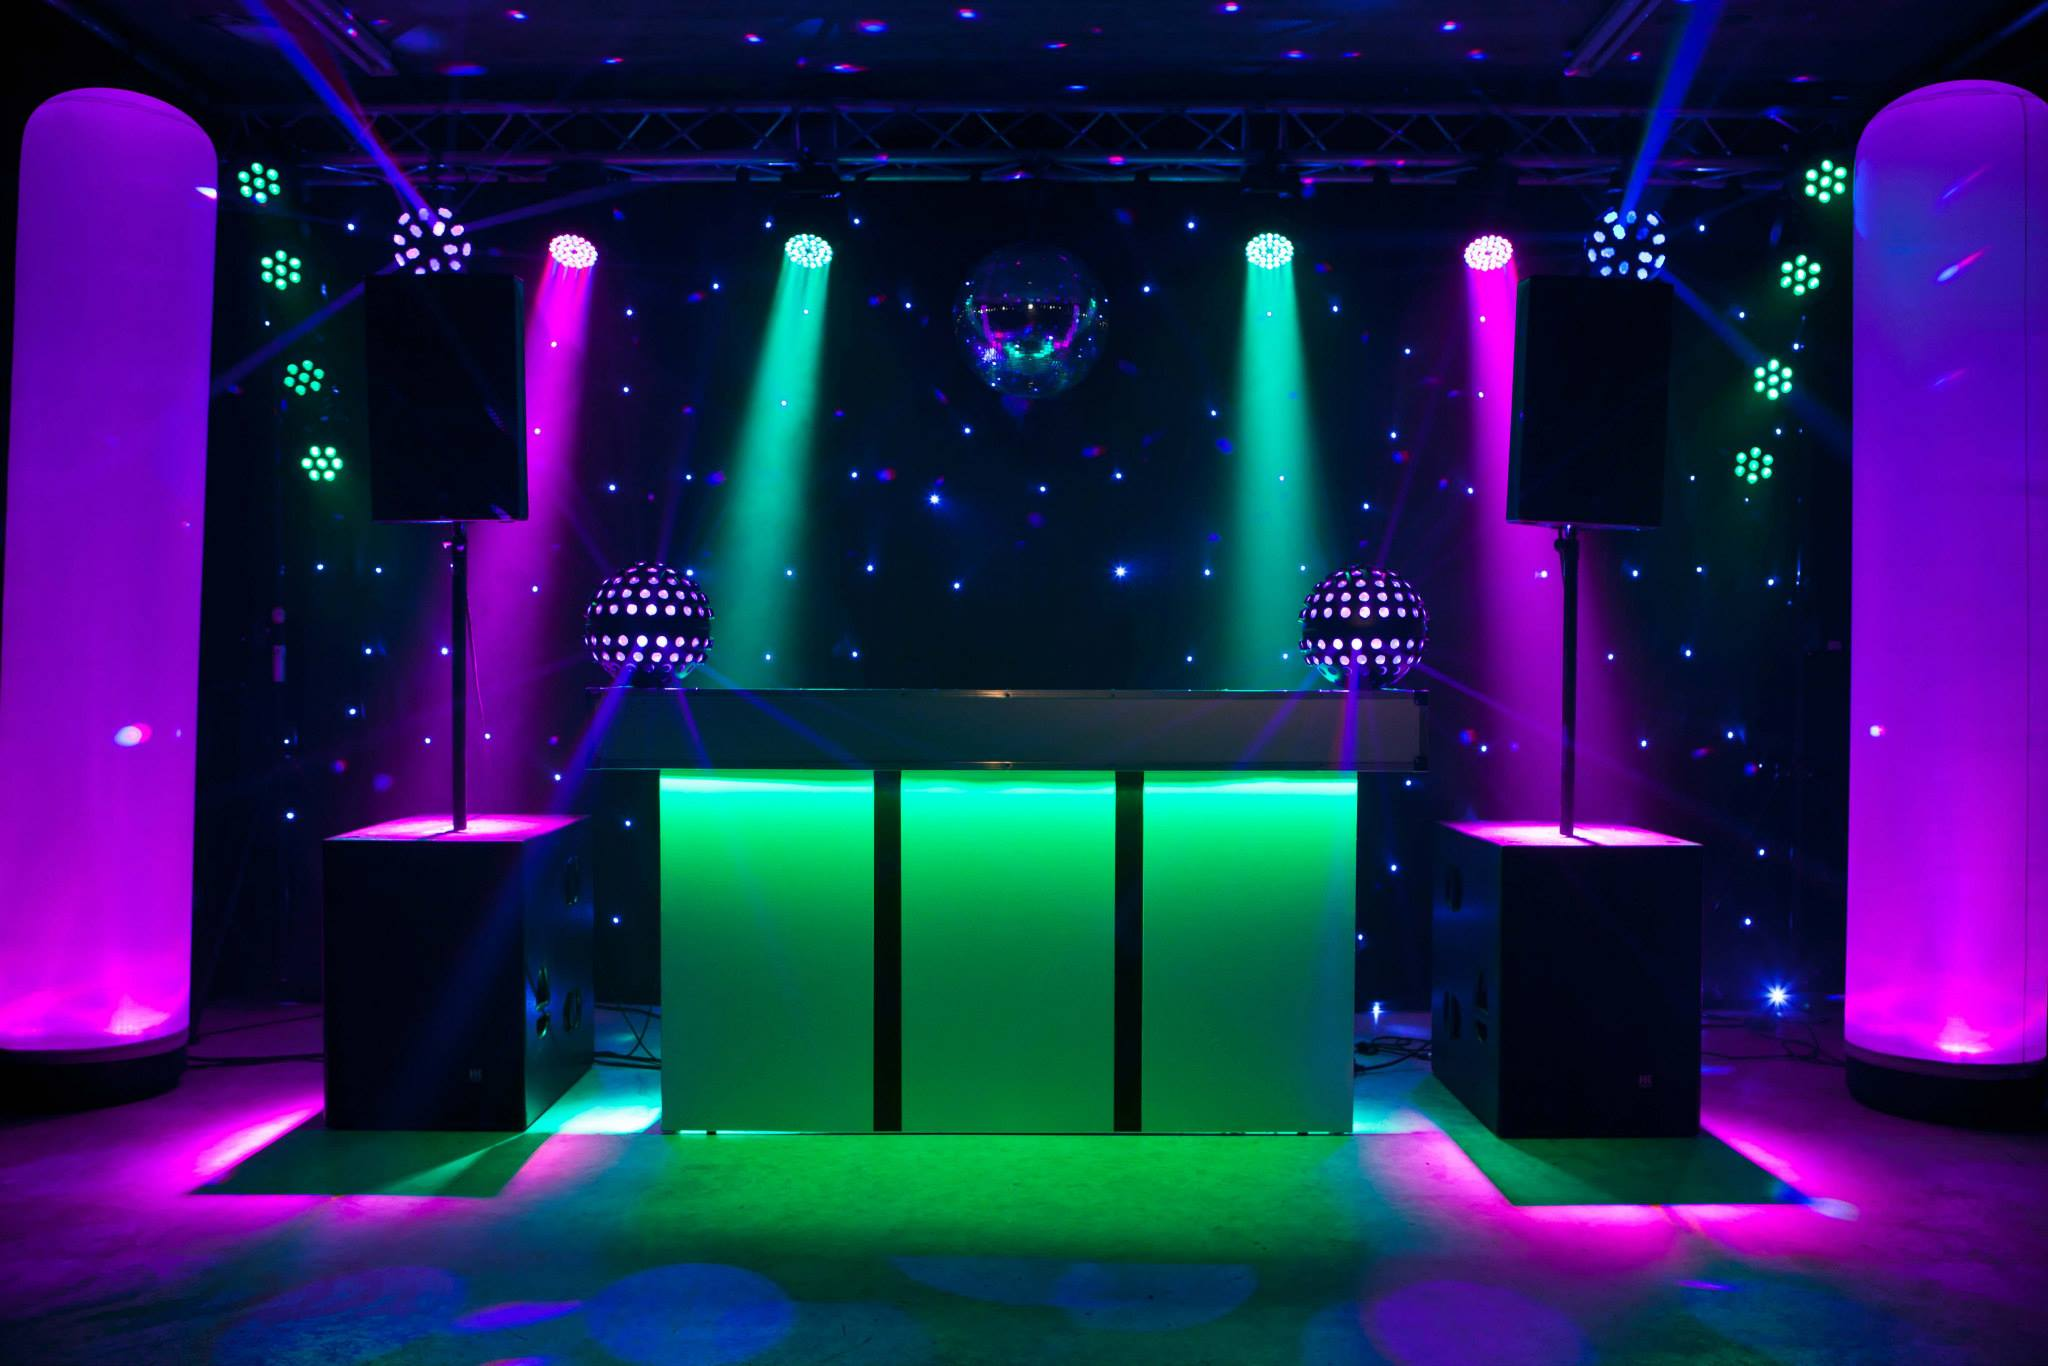 https://cdn.swinging.nl/wp-content/uploads/2018/05/Swinging-Ultimate-DJ-Show.jpg